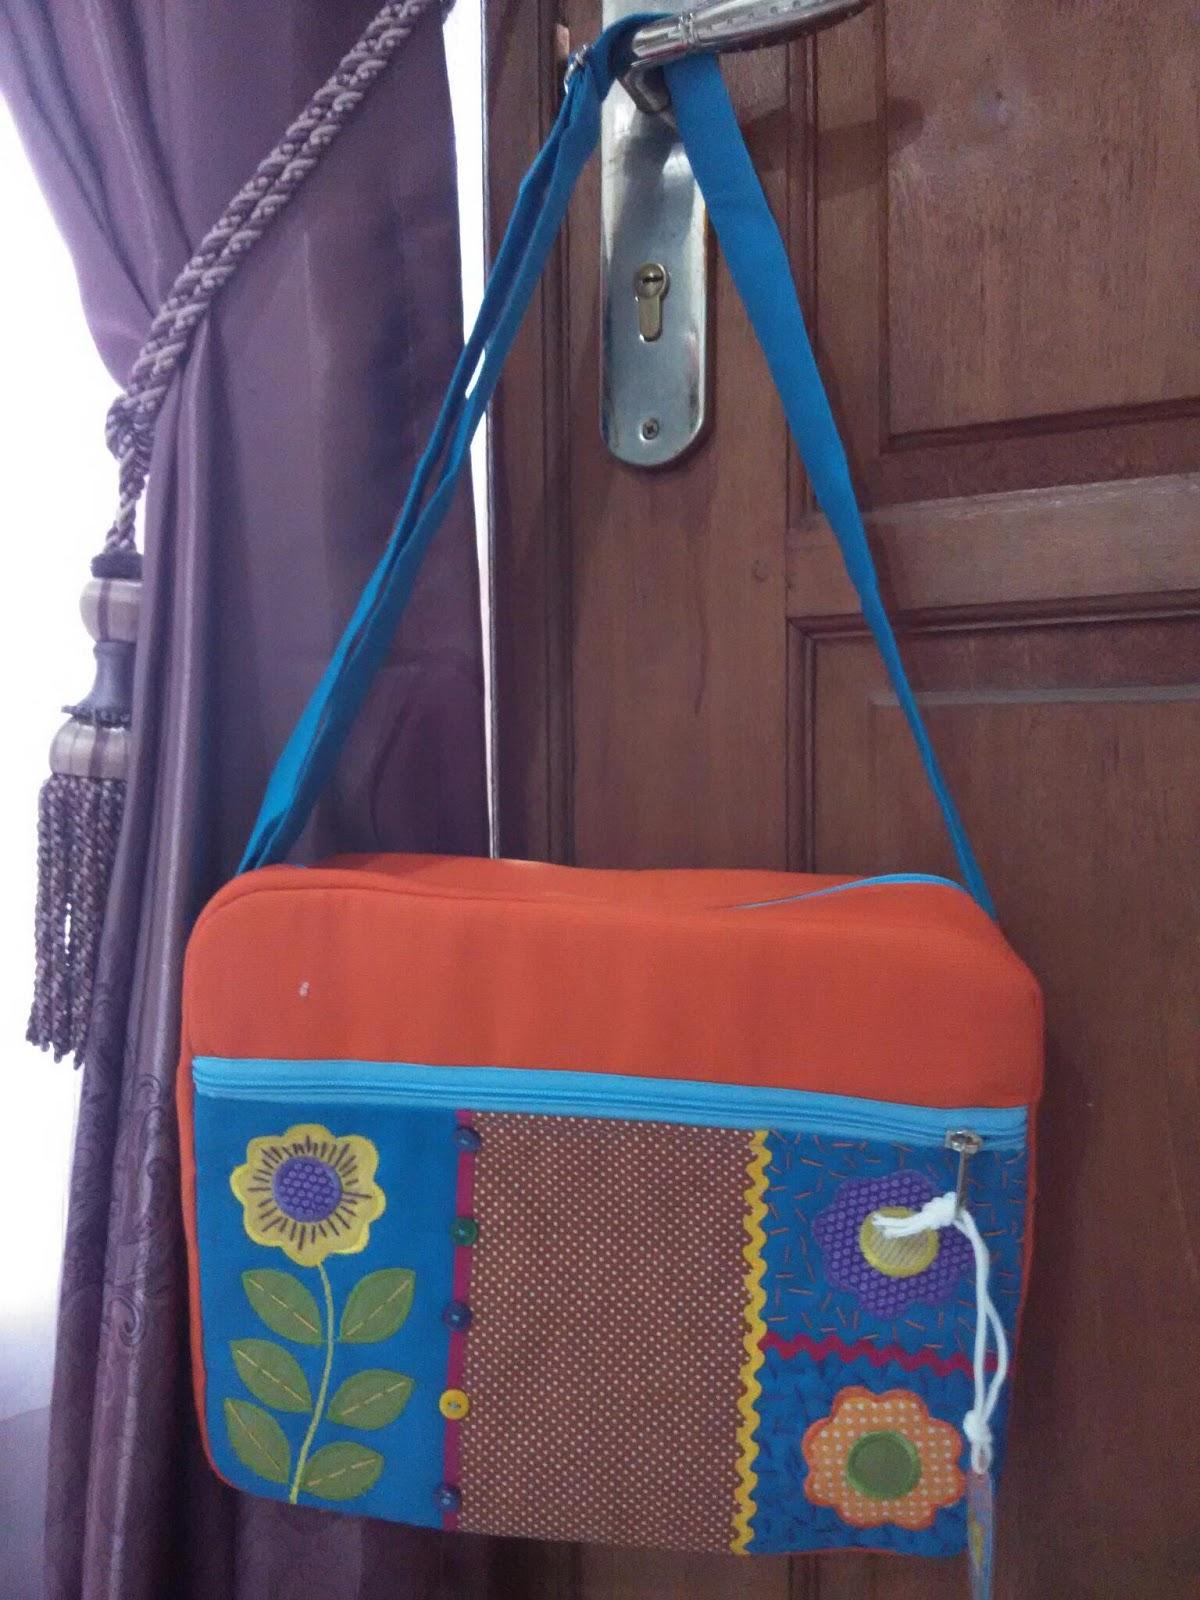 Jual tas selempang tas sekolah anak play grup sampe Sd kelas 6 tas sekolah anak Smp